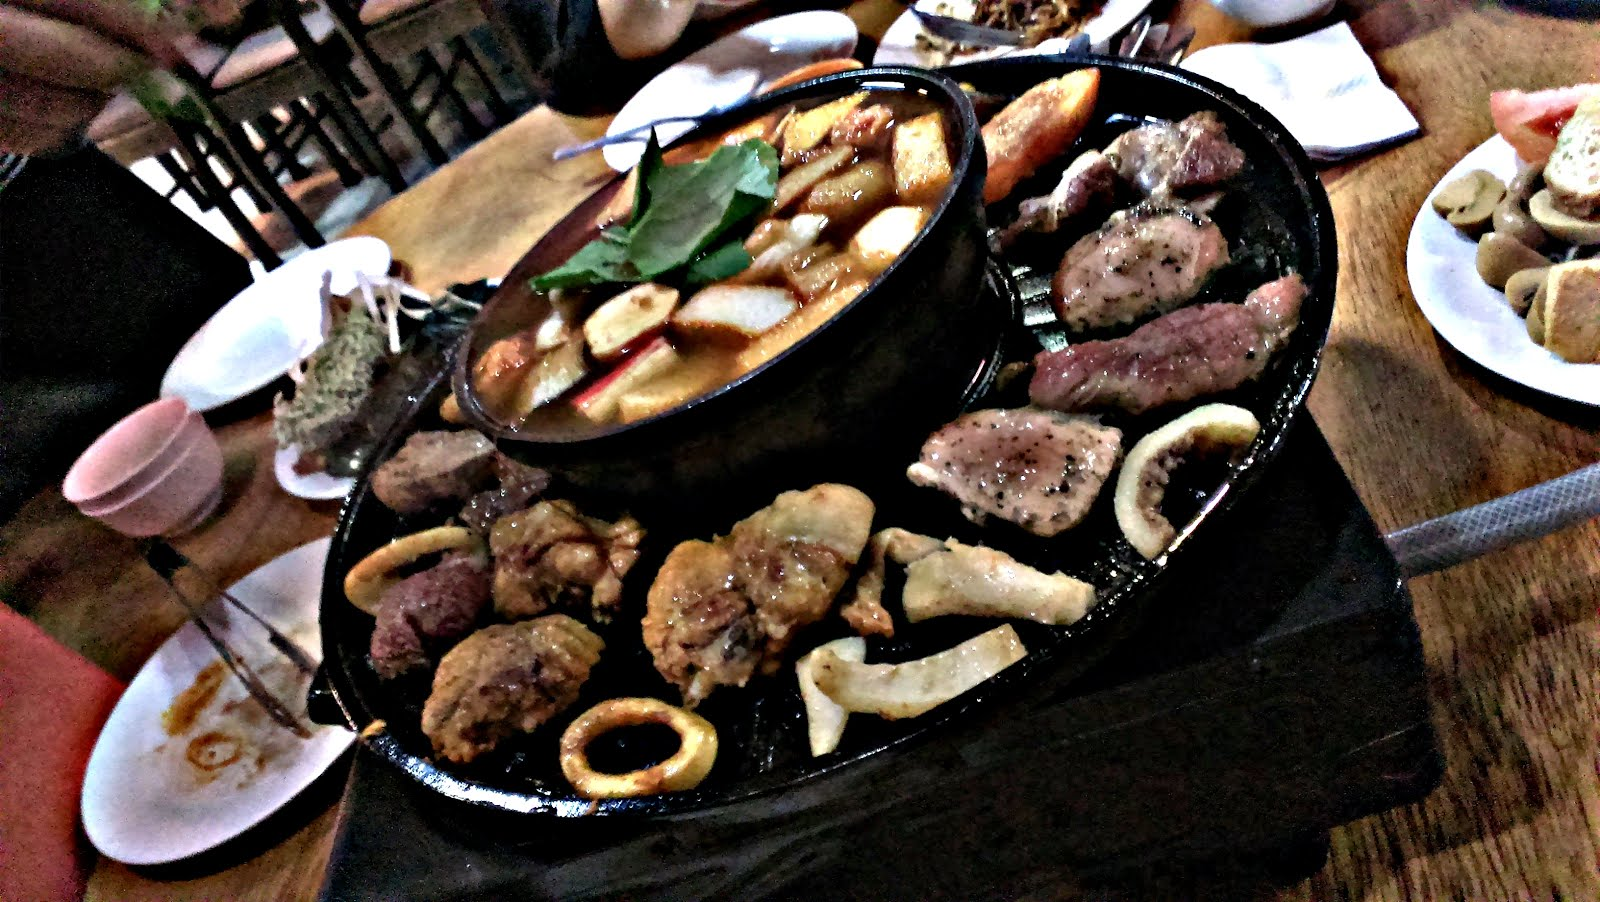 Steamboat BBQ Buffet D'Kayangan - Seksyen 13, Shah Alam, Selangor